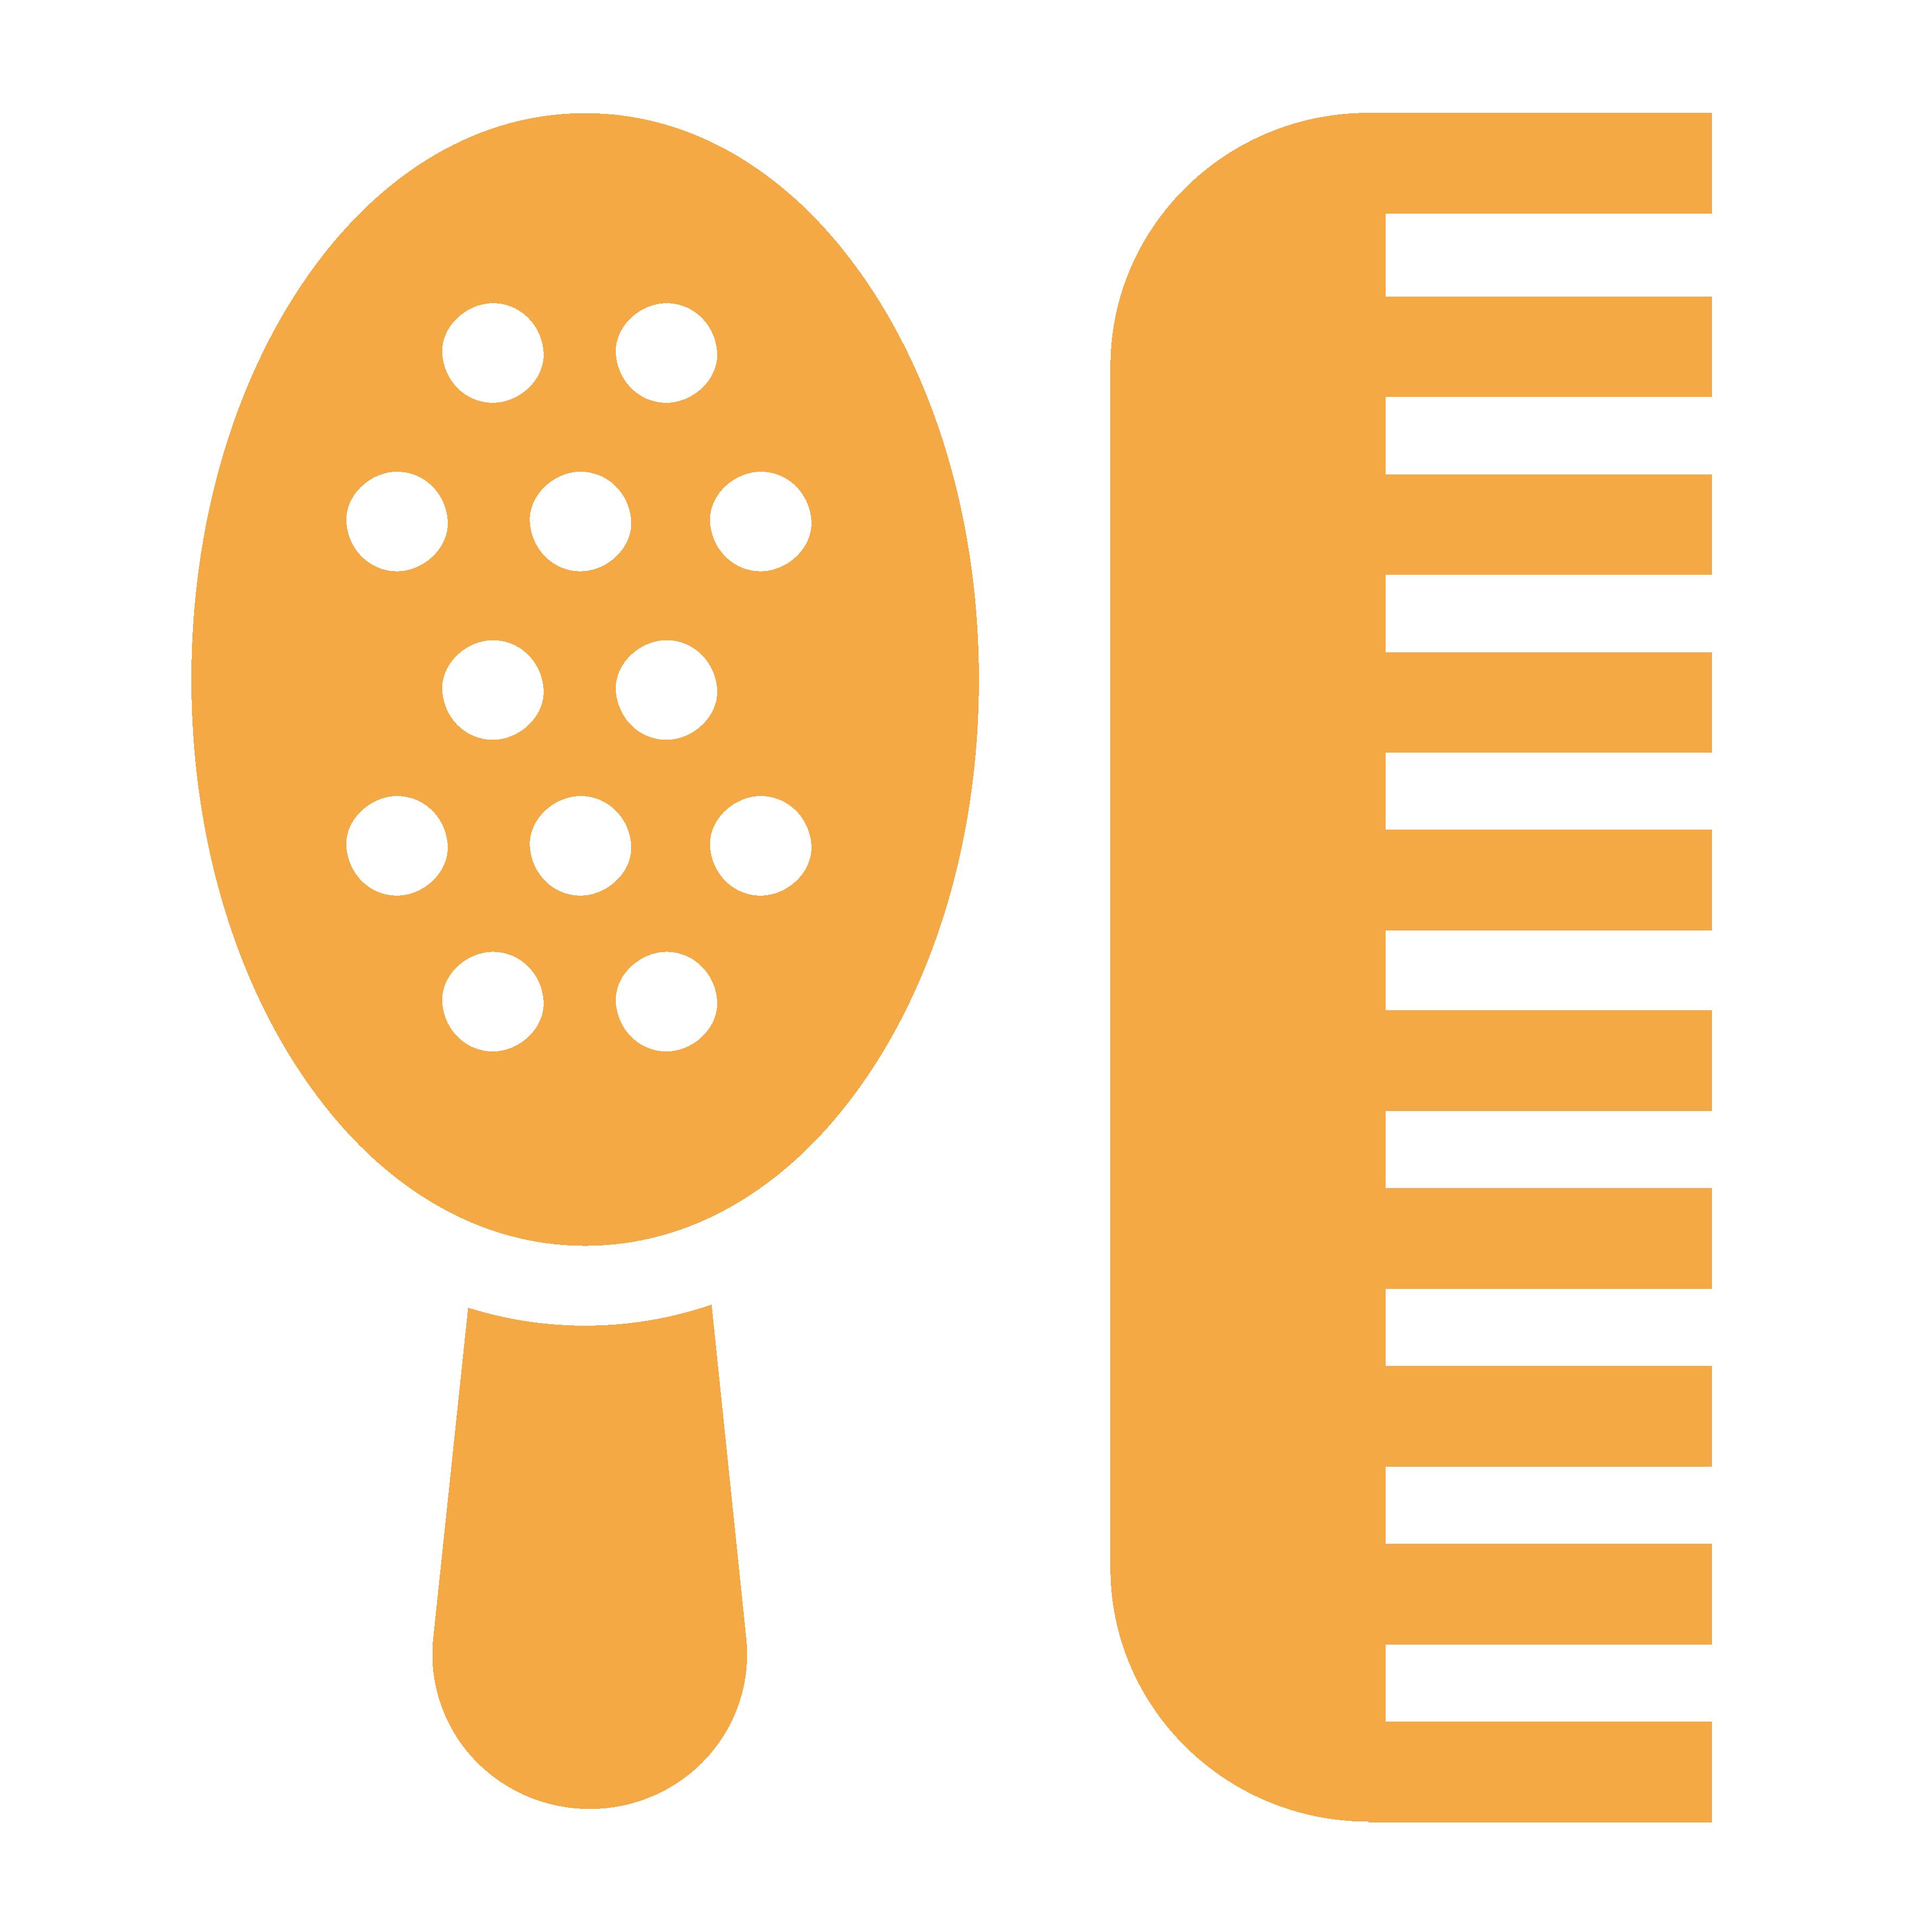 hřebeny ikona